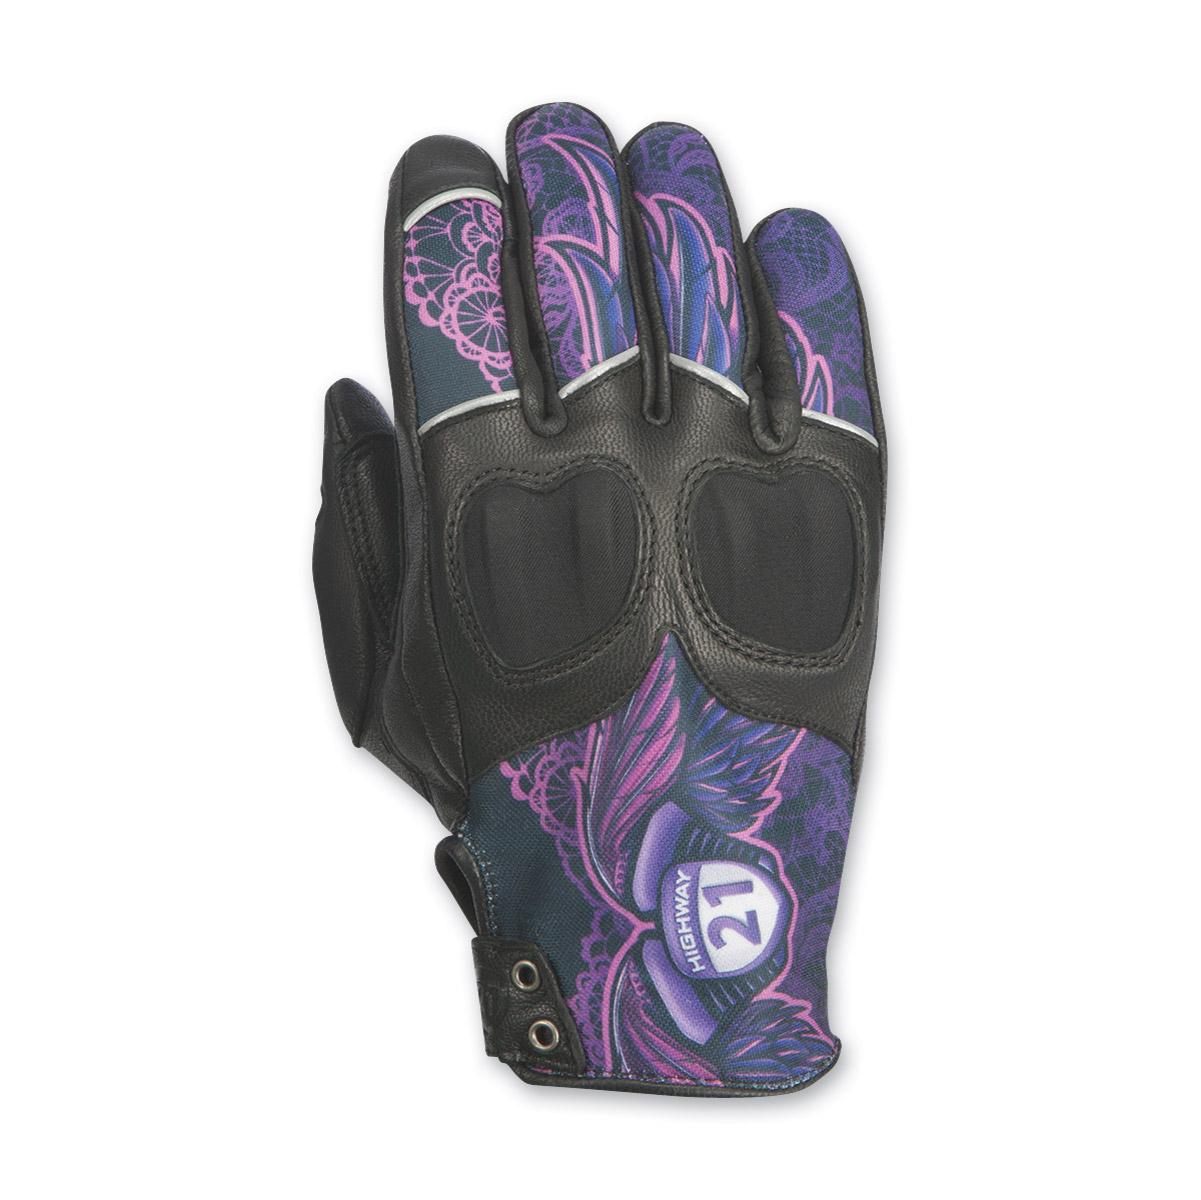 Highway 21 Women's Vixen Purple Leather Gloves